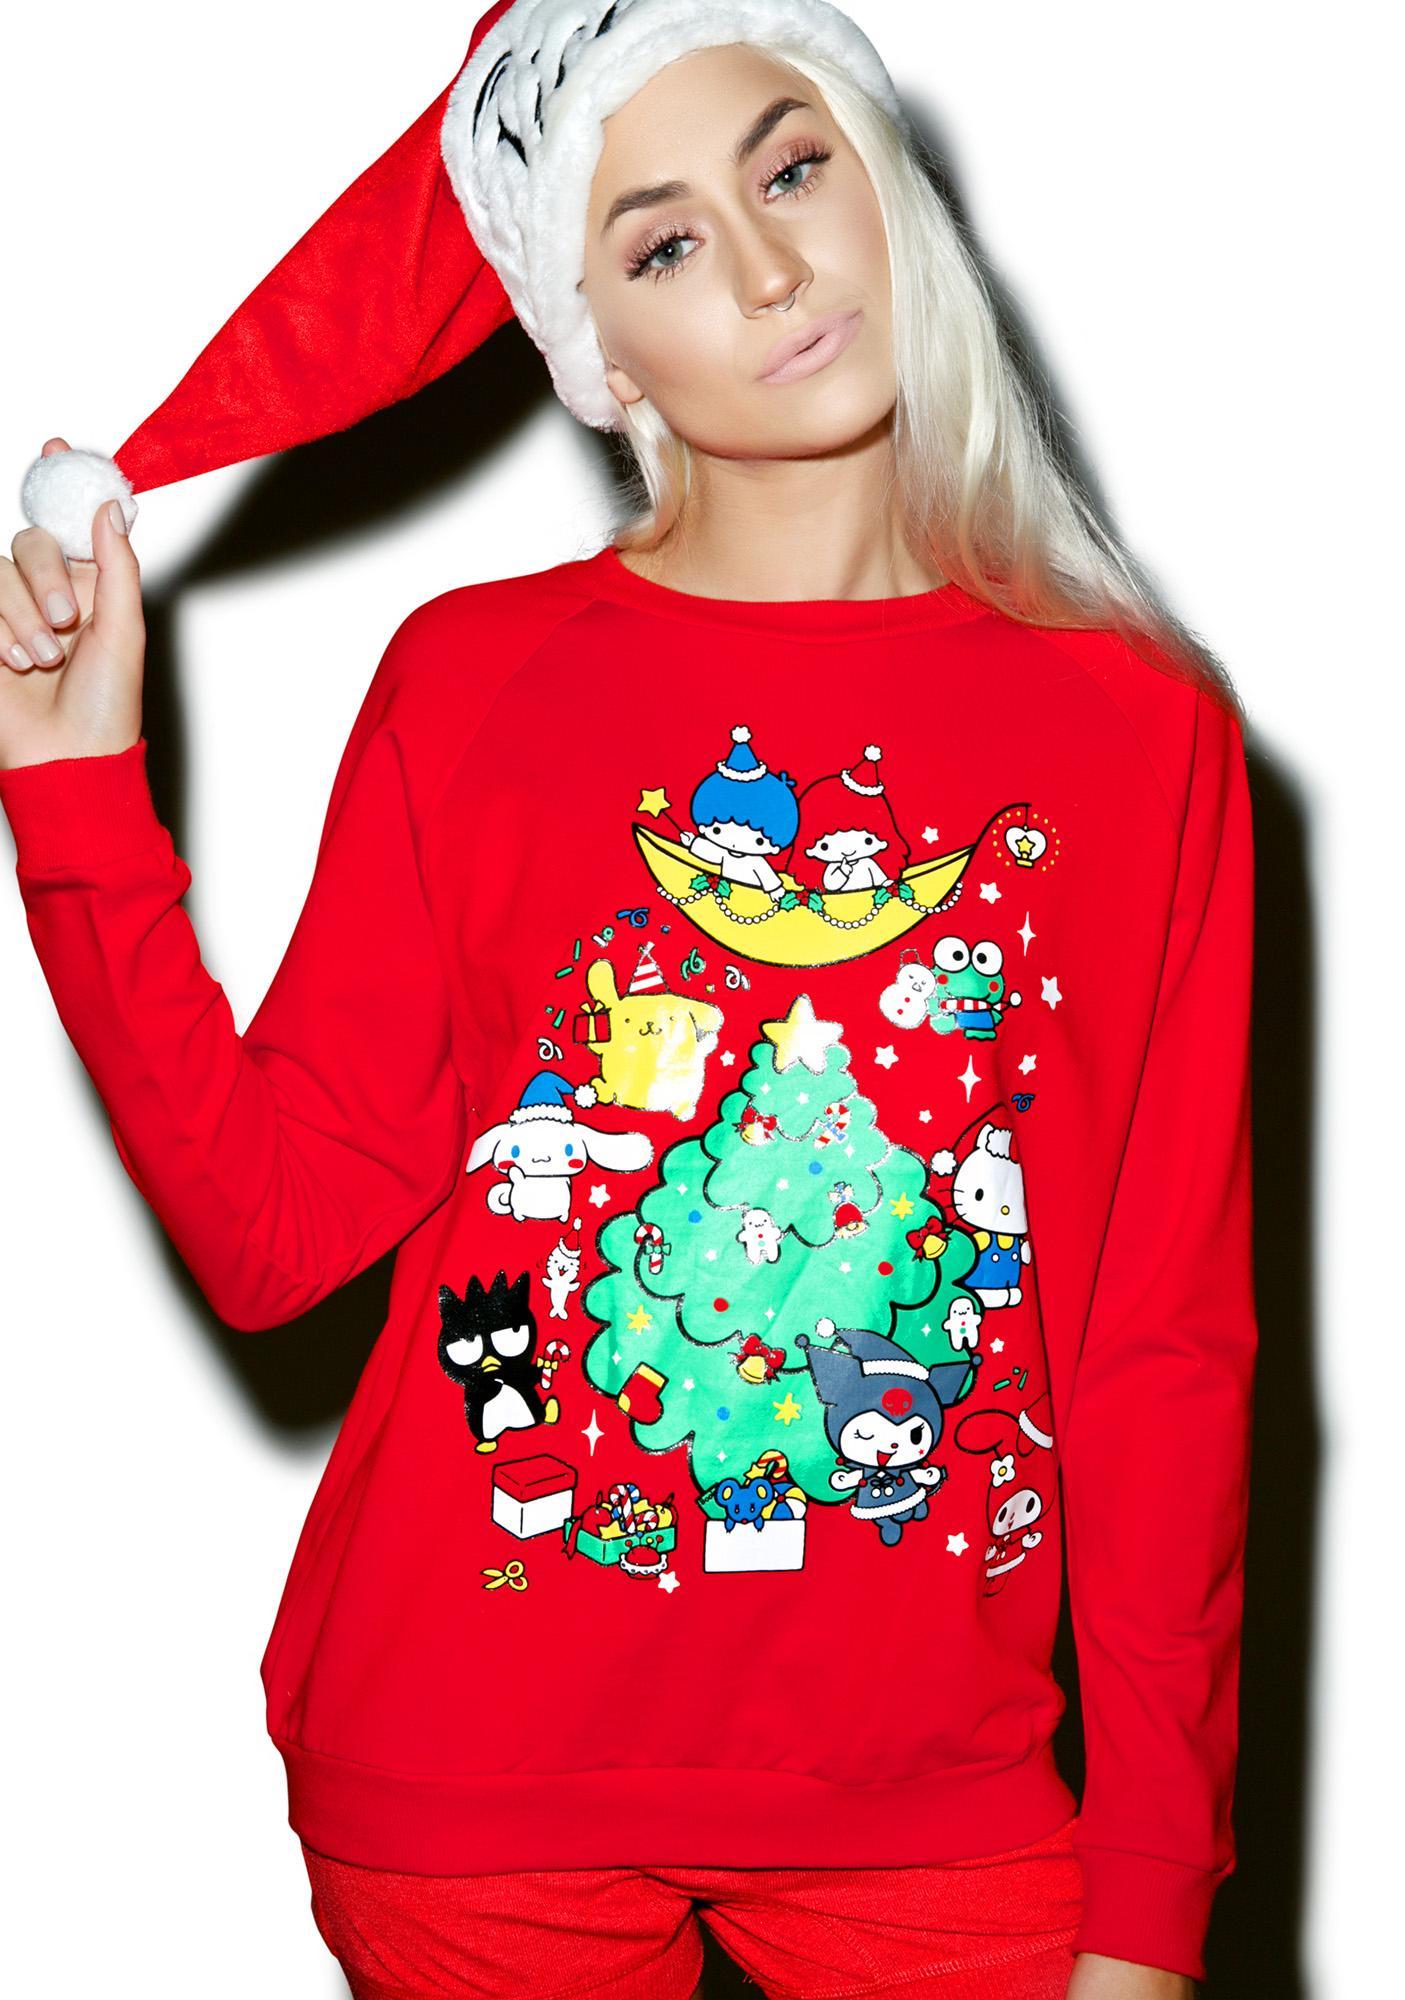 Japan L.A. Sanrio Holiday Sweatshirt